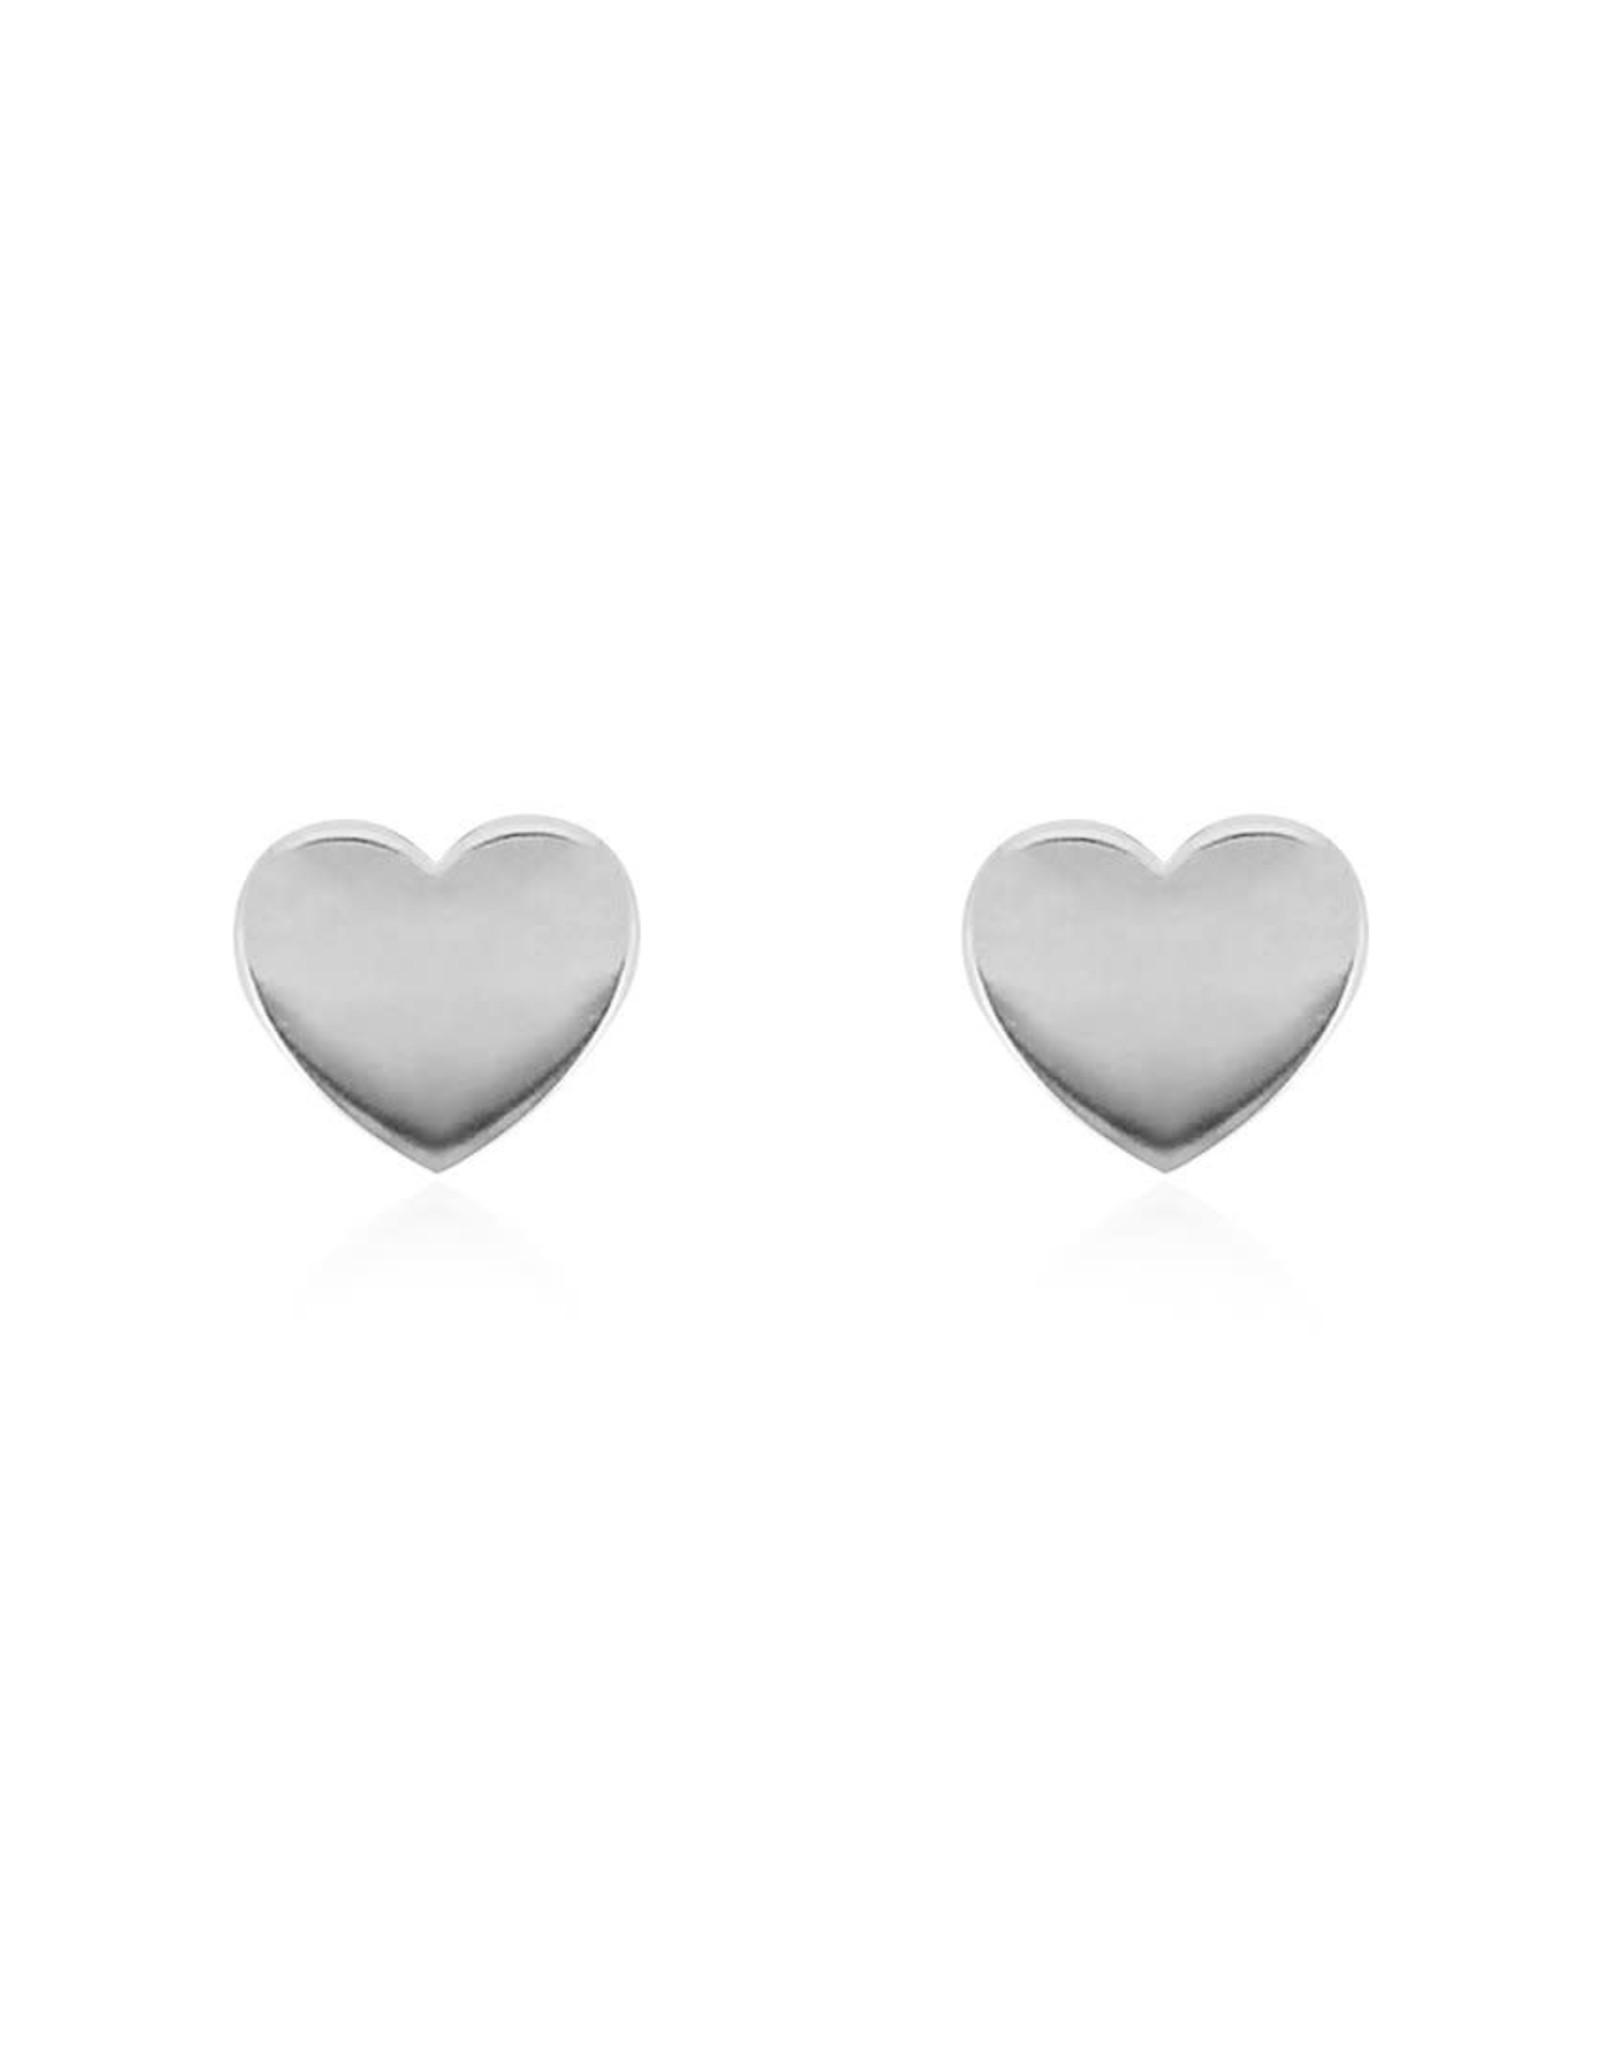 Linda Tahija Heart Stud Earrings, Silver